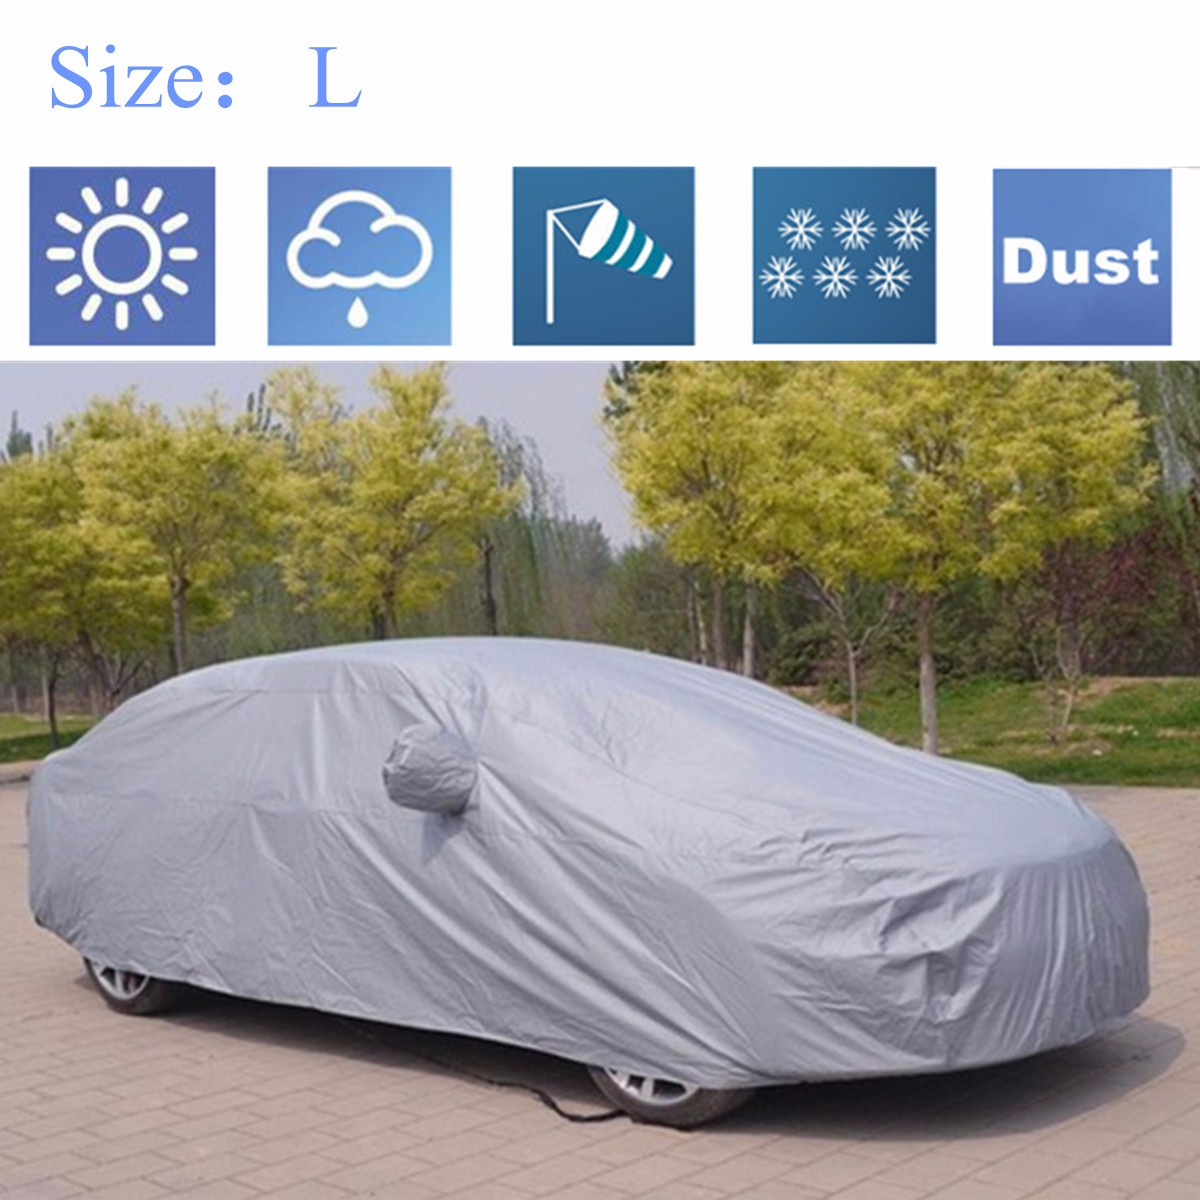 M/L/XL/XXL cubierta Universal de coche completa Anti lluvia nieve hielo impermeable a prueba de polvo UV al aire libre